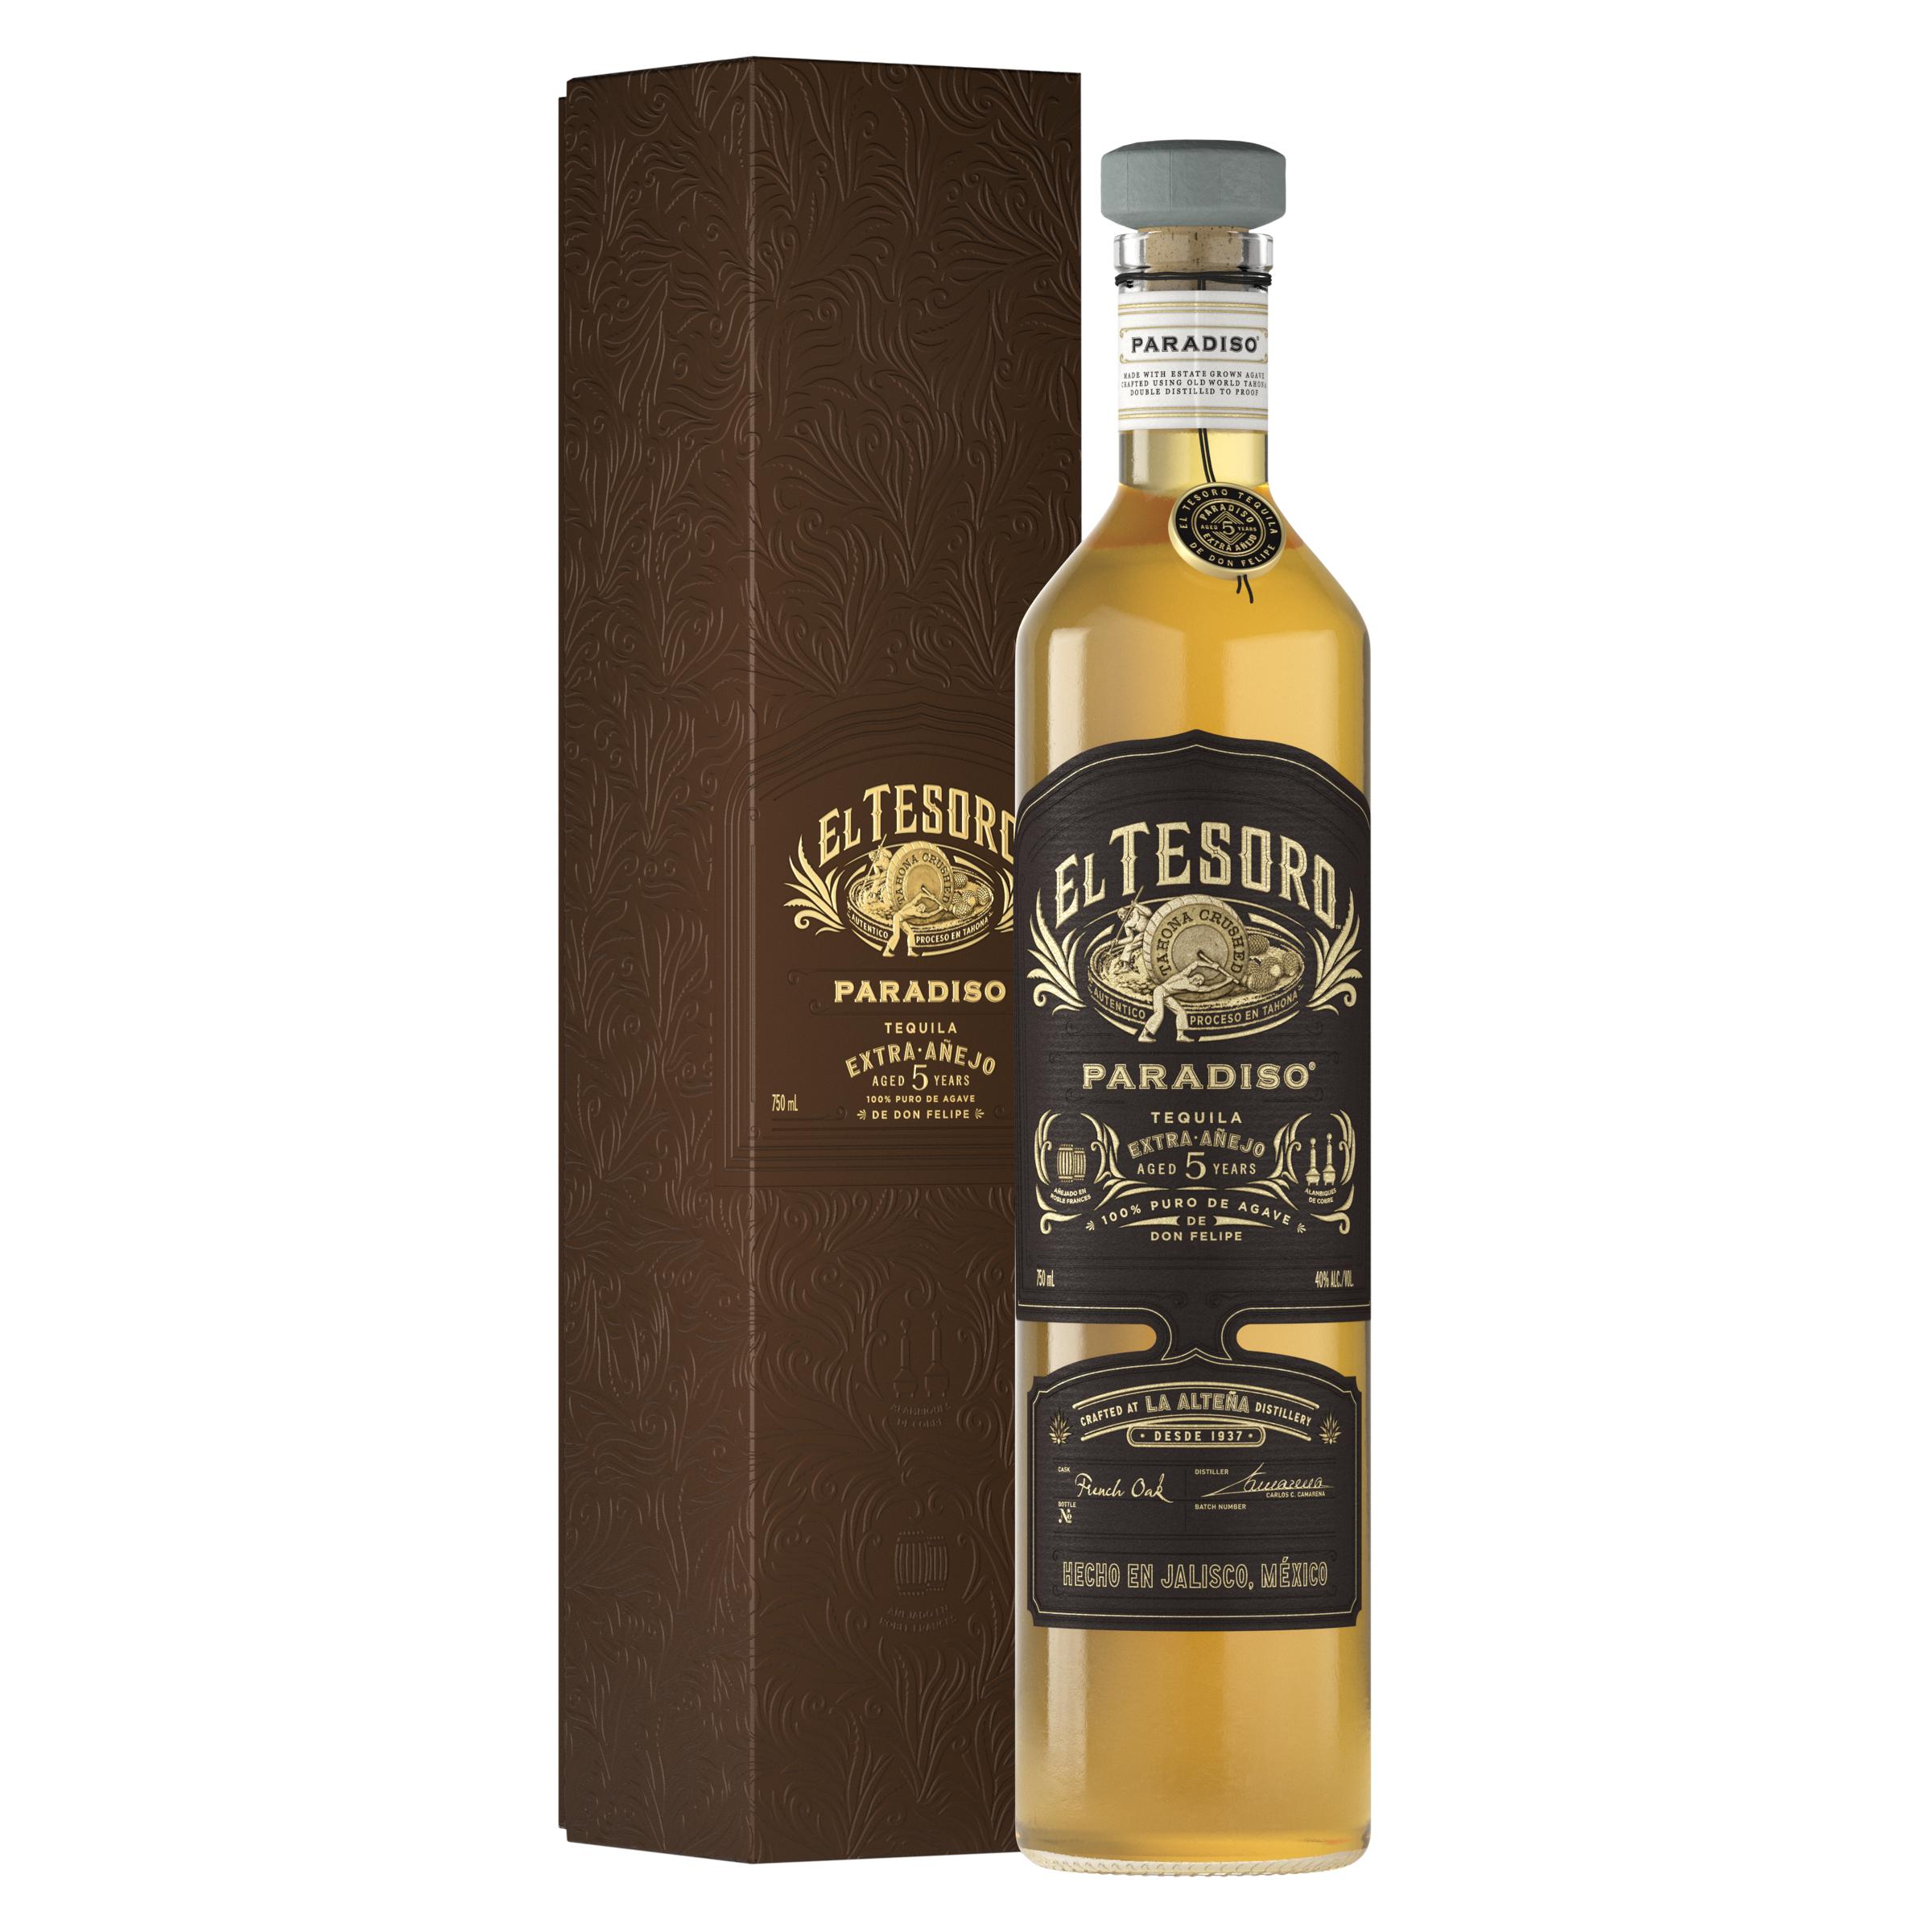 El Capo Extra-Aged Anejo Tequila